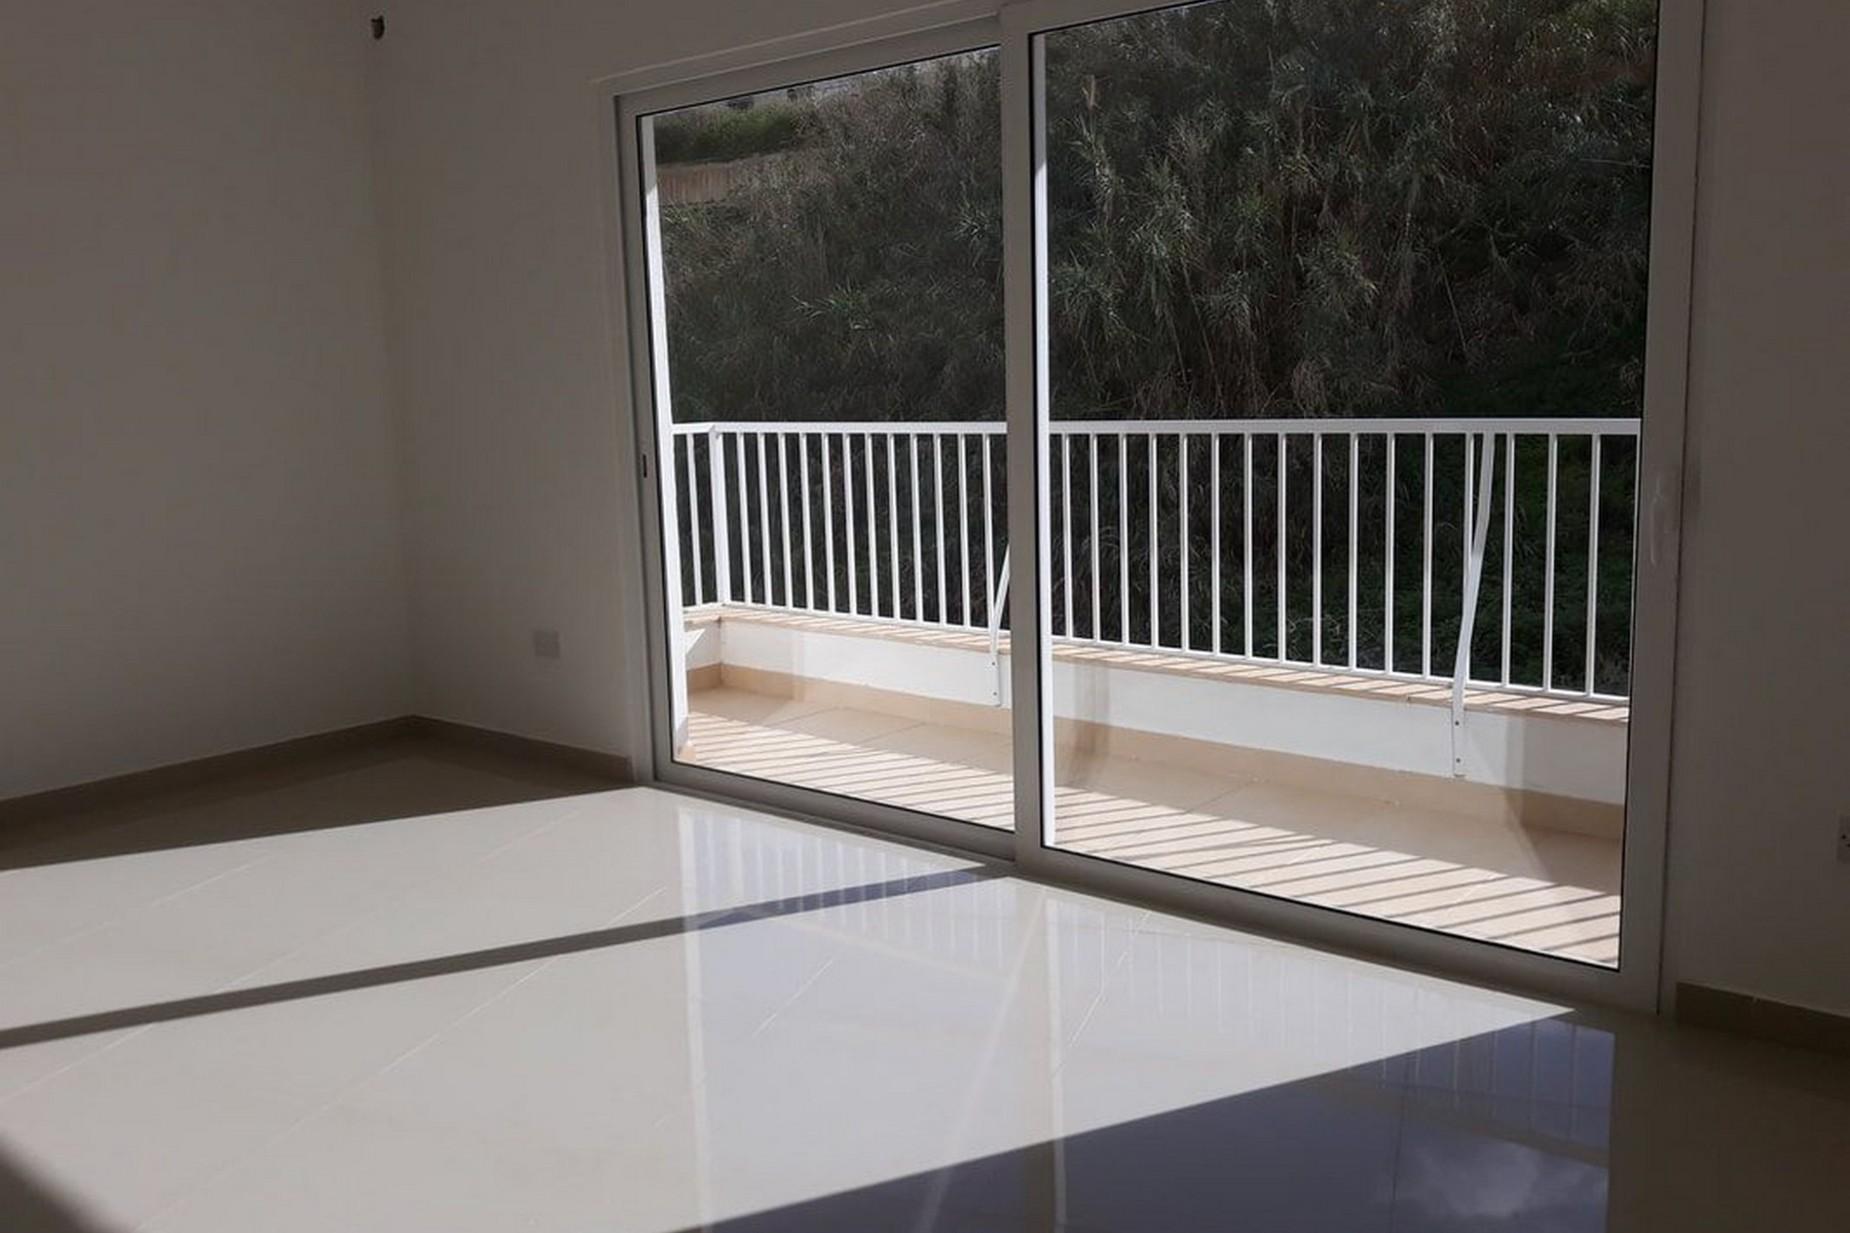 3 bed Apartment For Sale in Xemxija, Xemxija - thumb 5